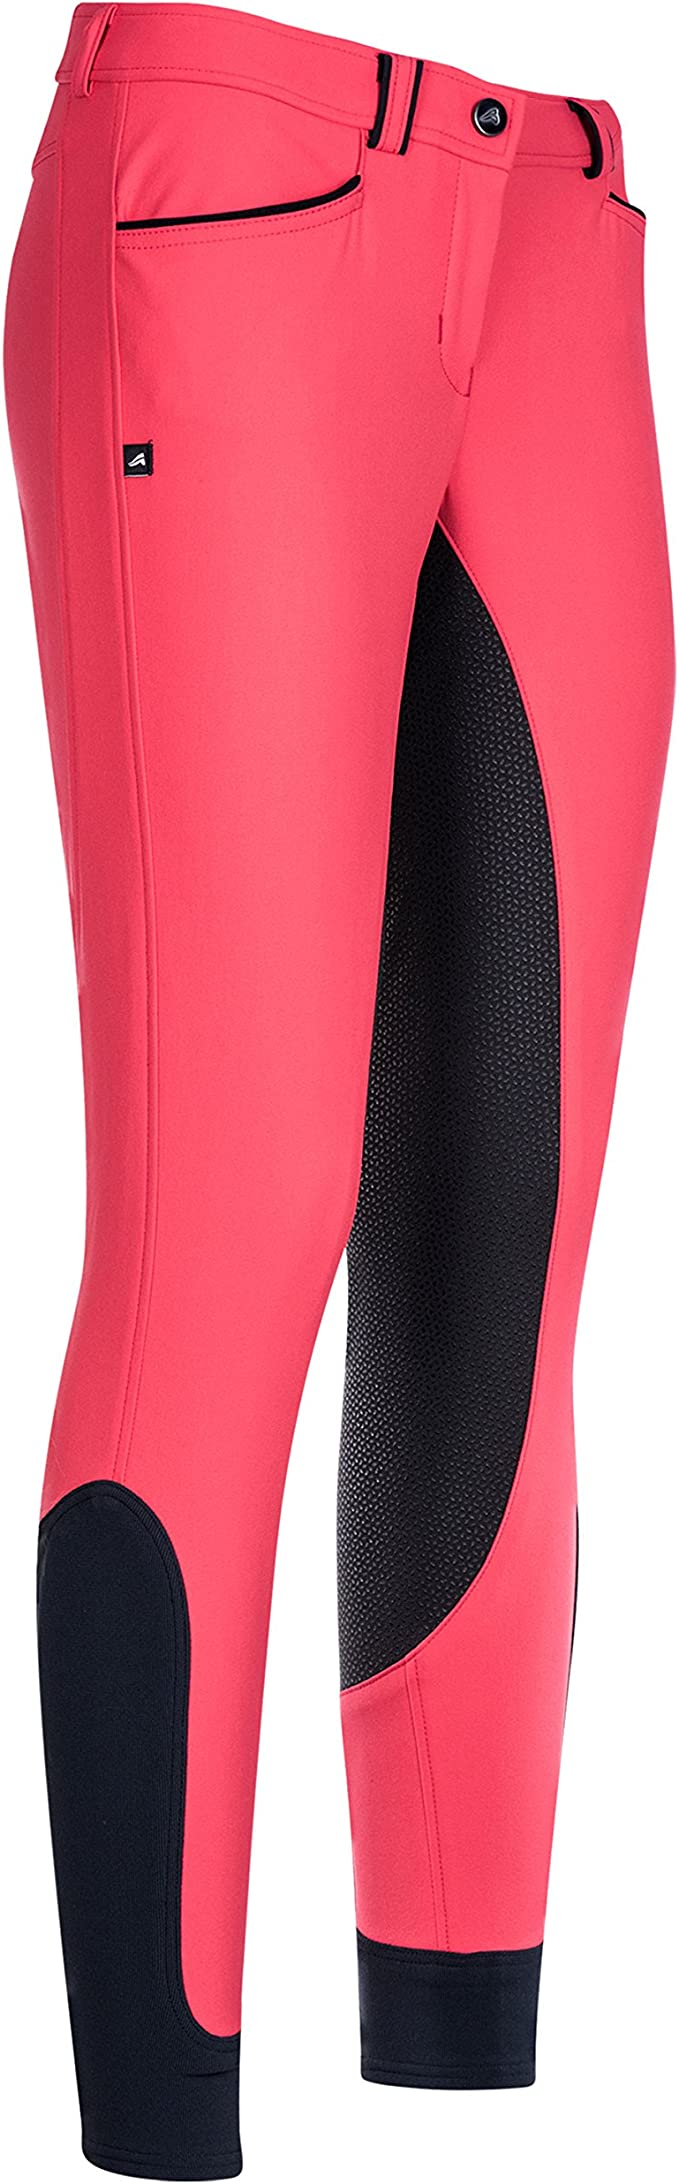 EuroStar Damen Softshell-Reithose Carina FullGrip UVP 169,95€